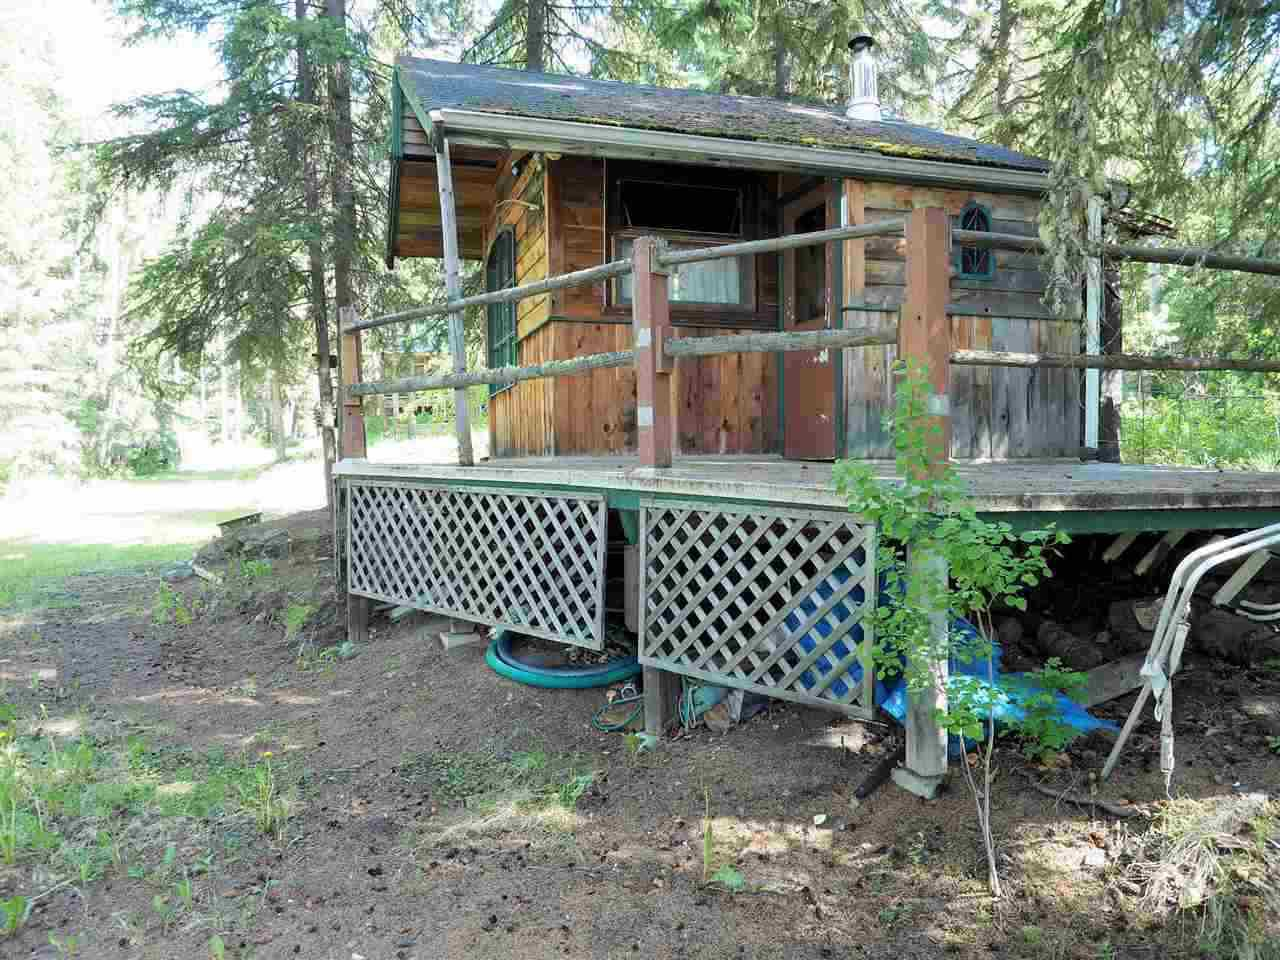 Photo 22: Photos: 8222 CENTENNIAL Road in Bridge Lake: Bridge Lake/Sheridan Lake House for sale (100 Mile House (Zone 10))  : MLS®# R2457362